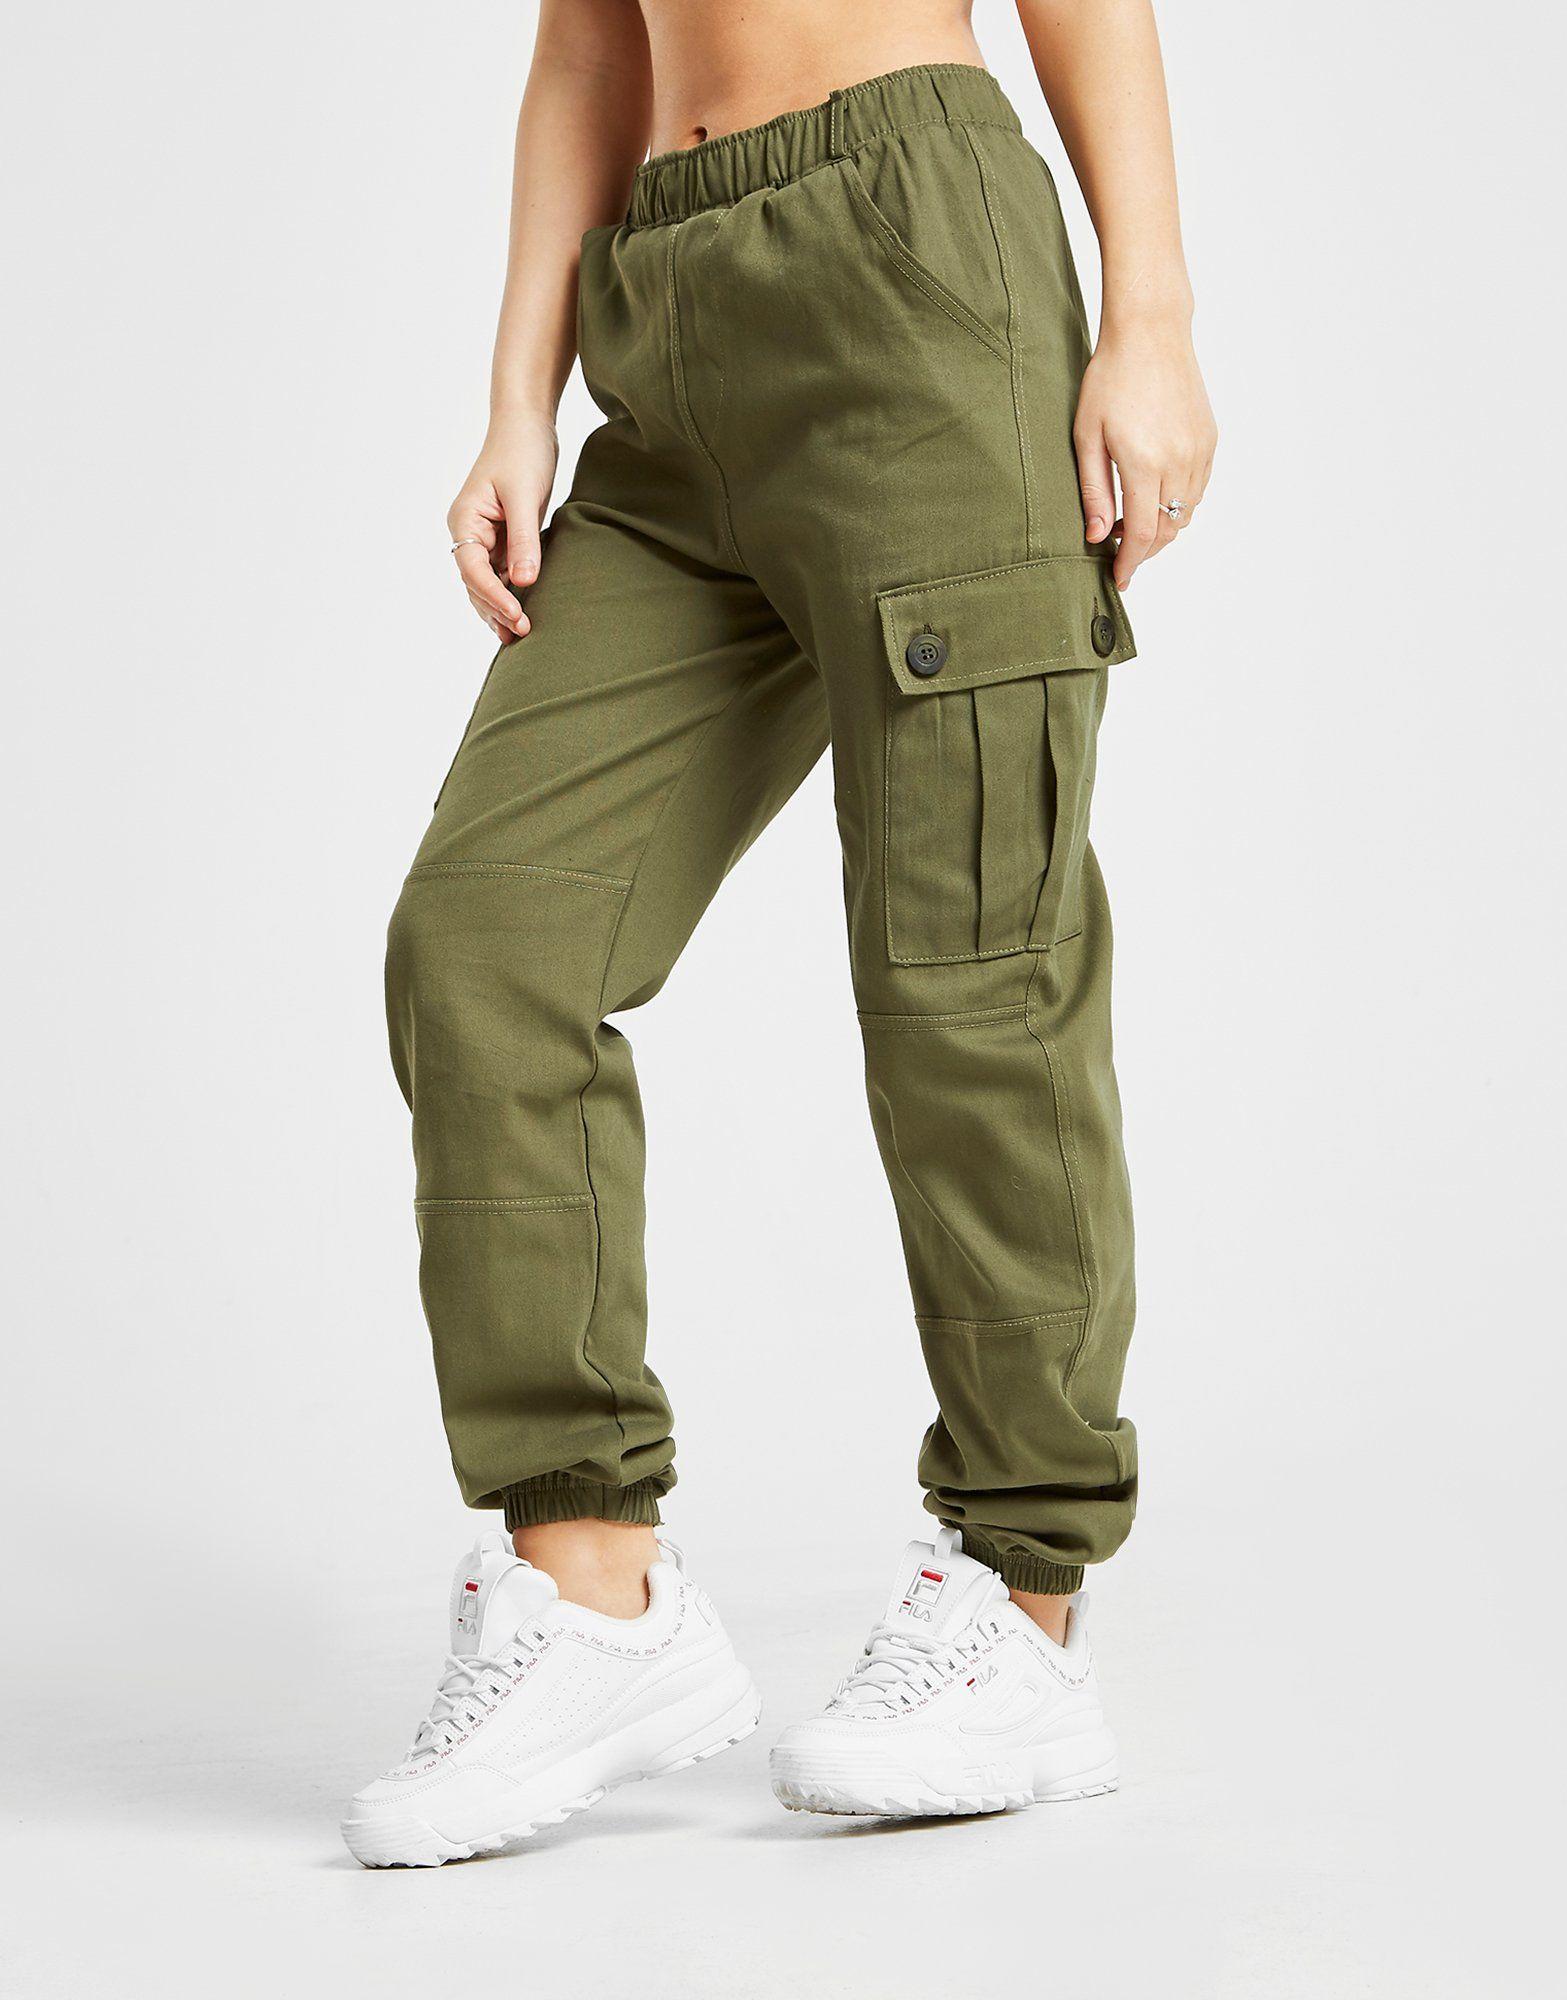 Supply & Demand Cargo Pants